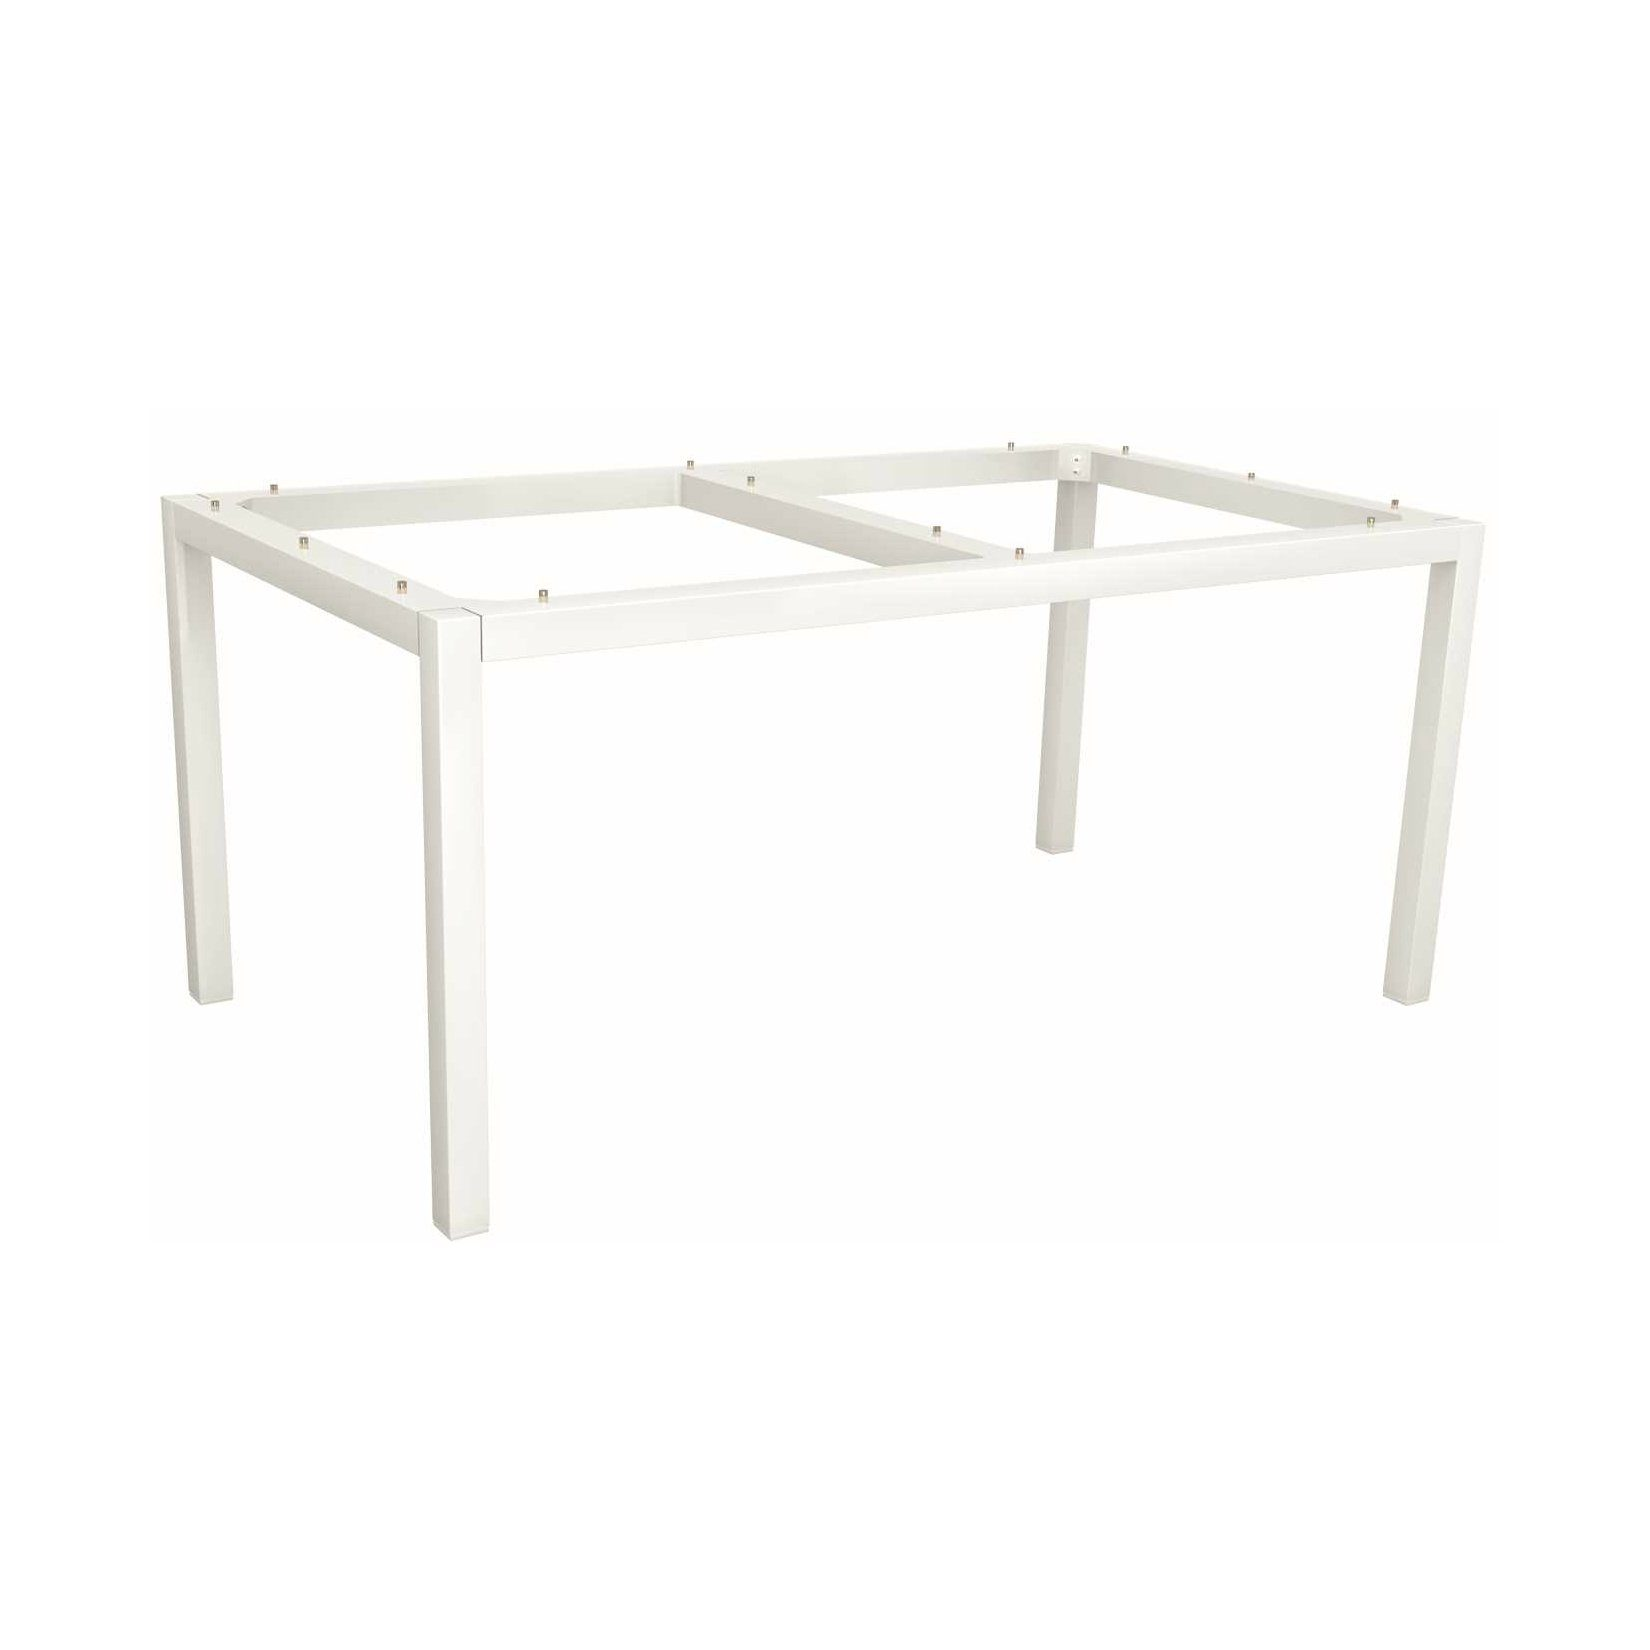 stern tischsystem gartentisch aluminium keramik. Black Bedroom Furniture Sets. Home Design Ideas